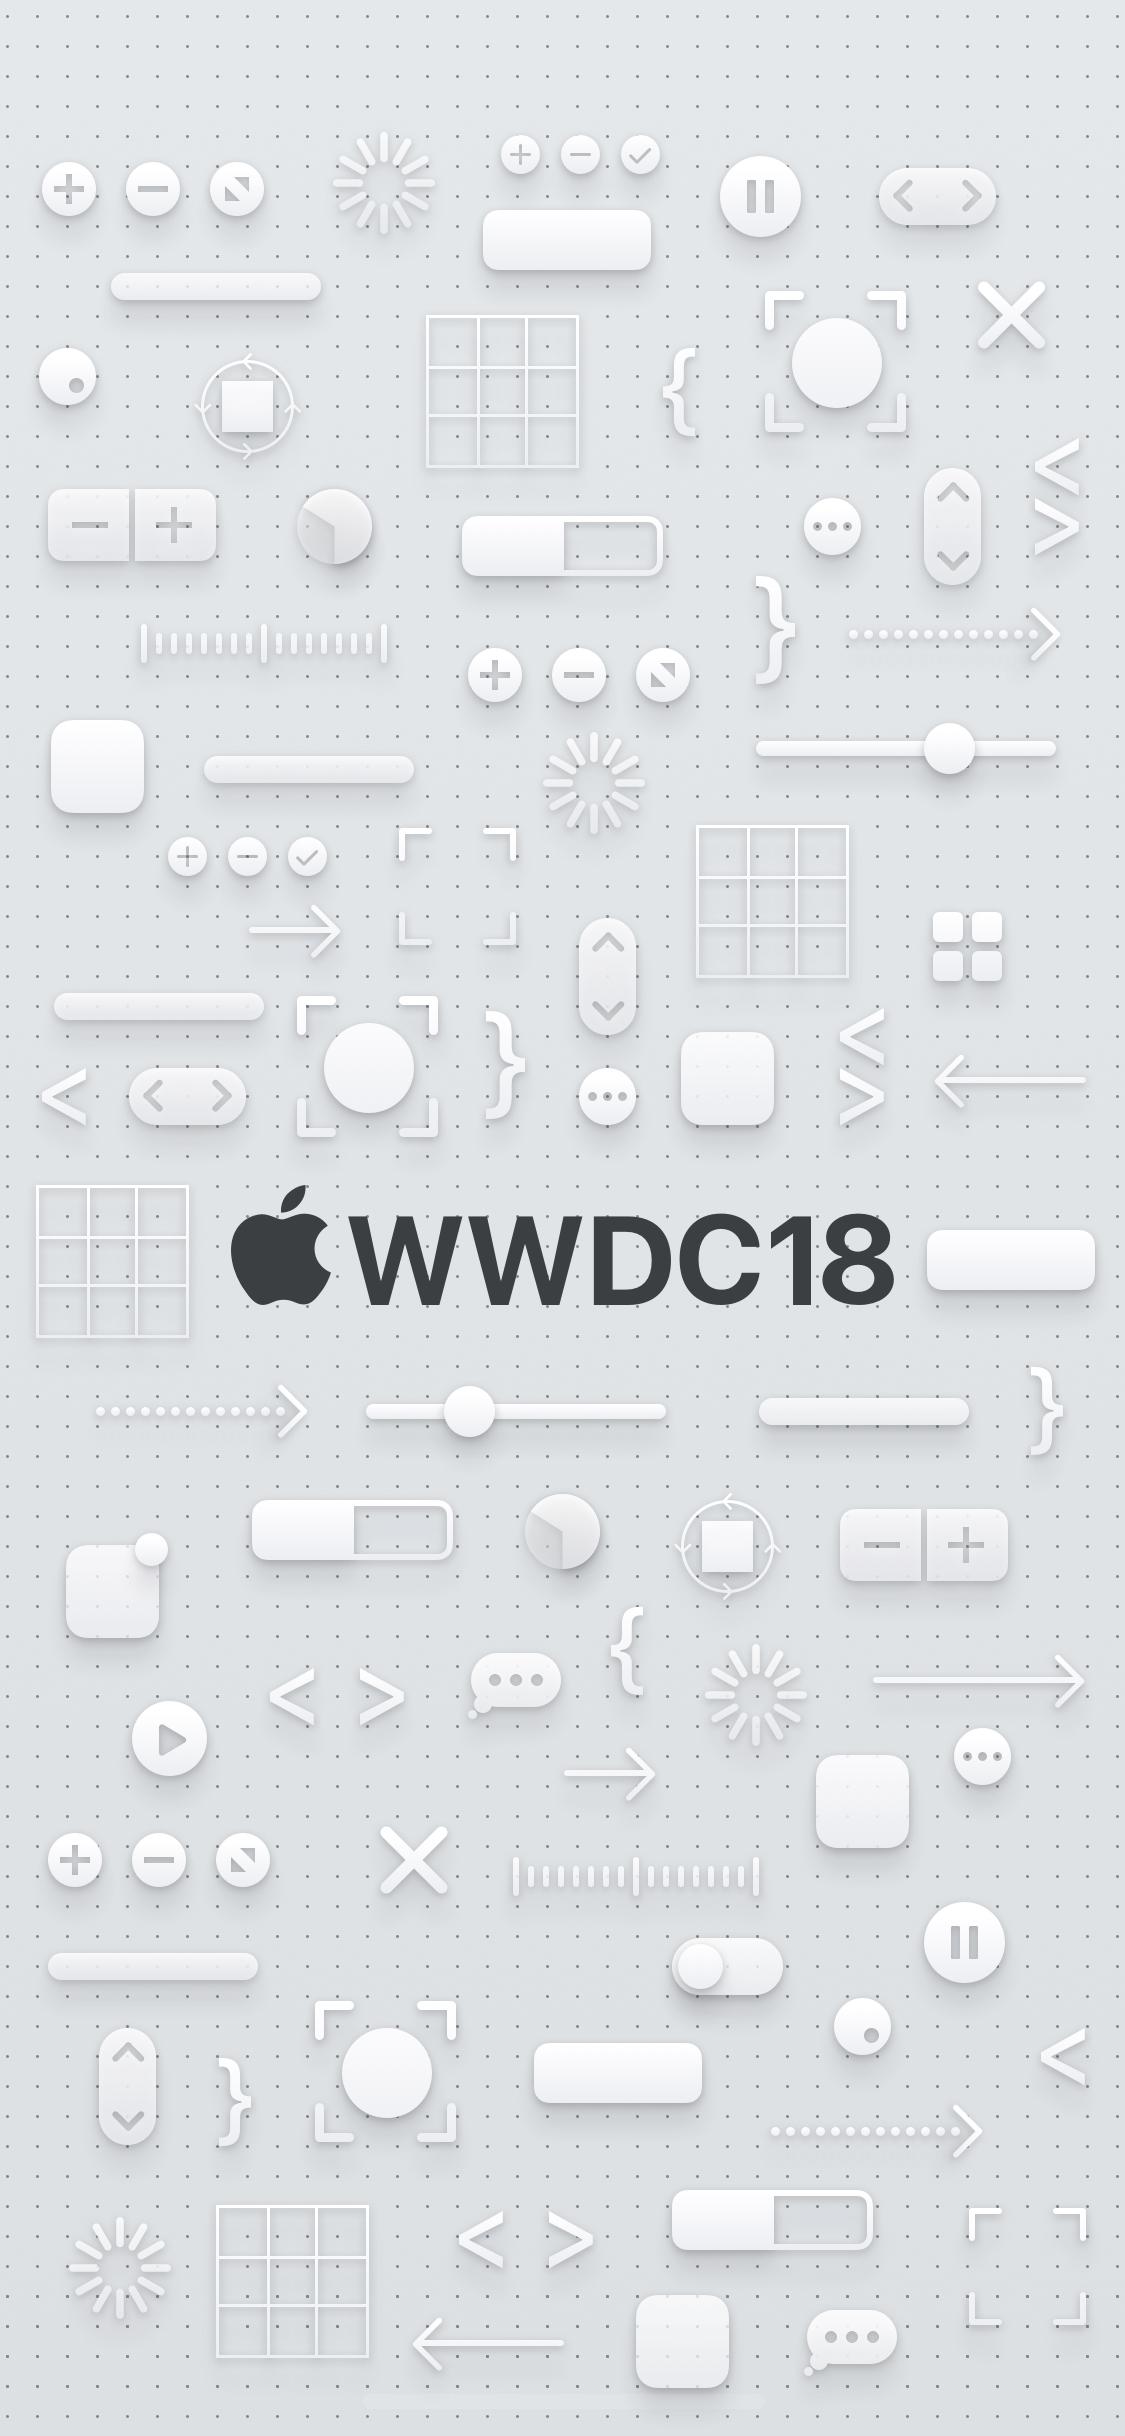 Download Wallpaper Apple Iphone แจกภาพพื้นหลัง Wallpaper ชุด Wwdc18 สำหรับ Iphone